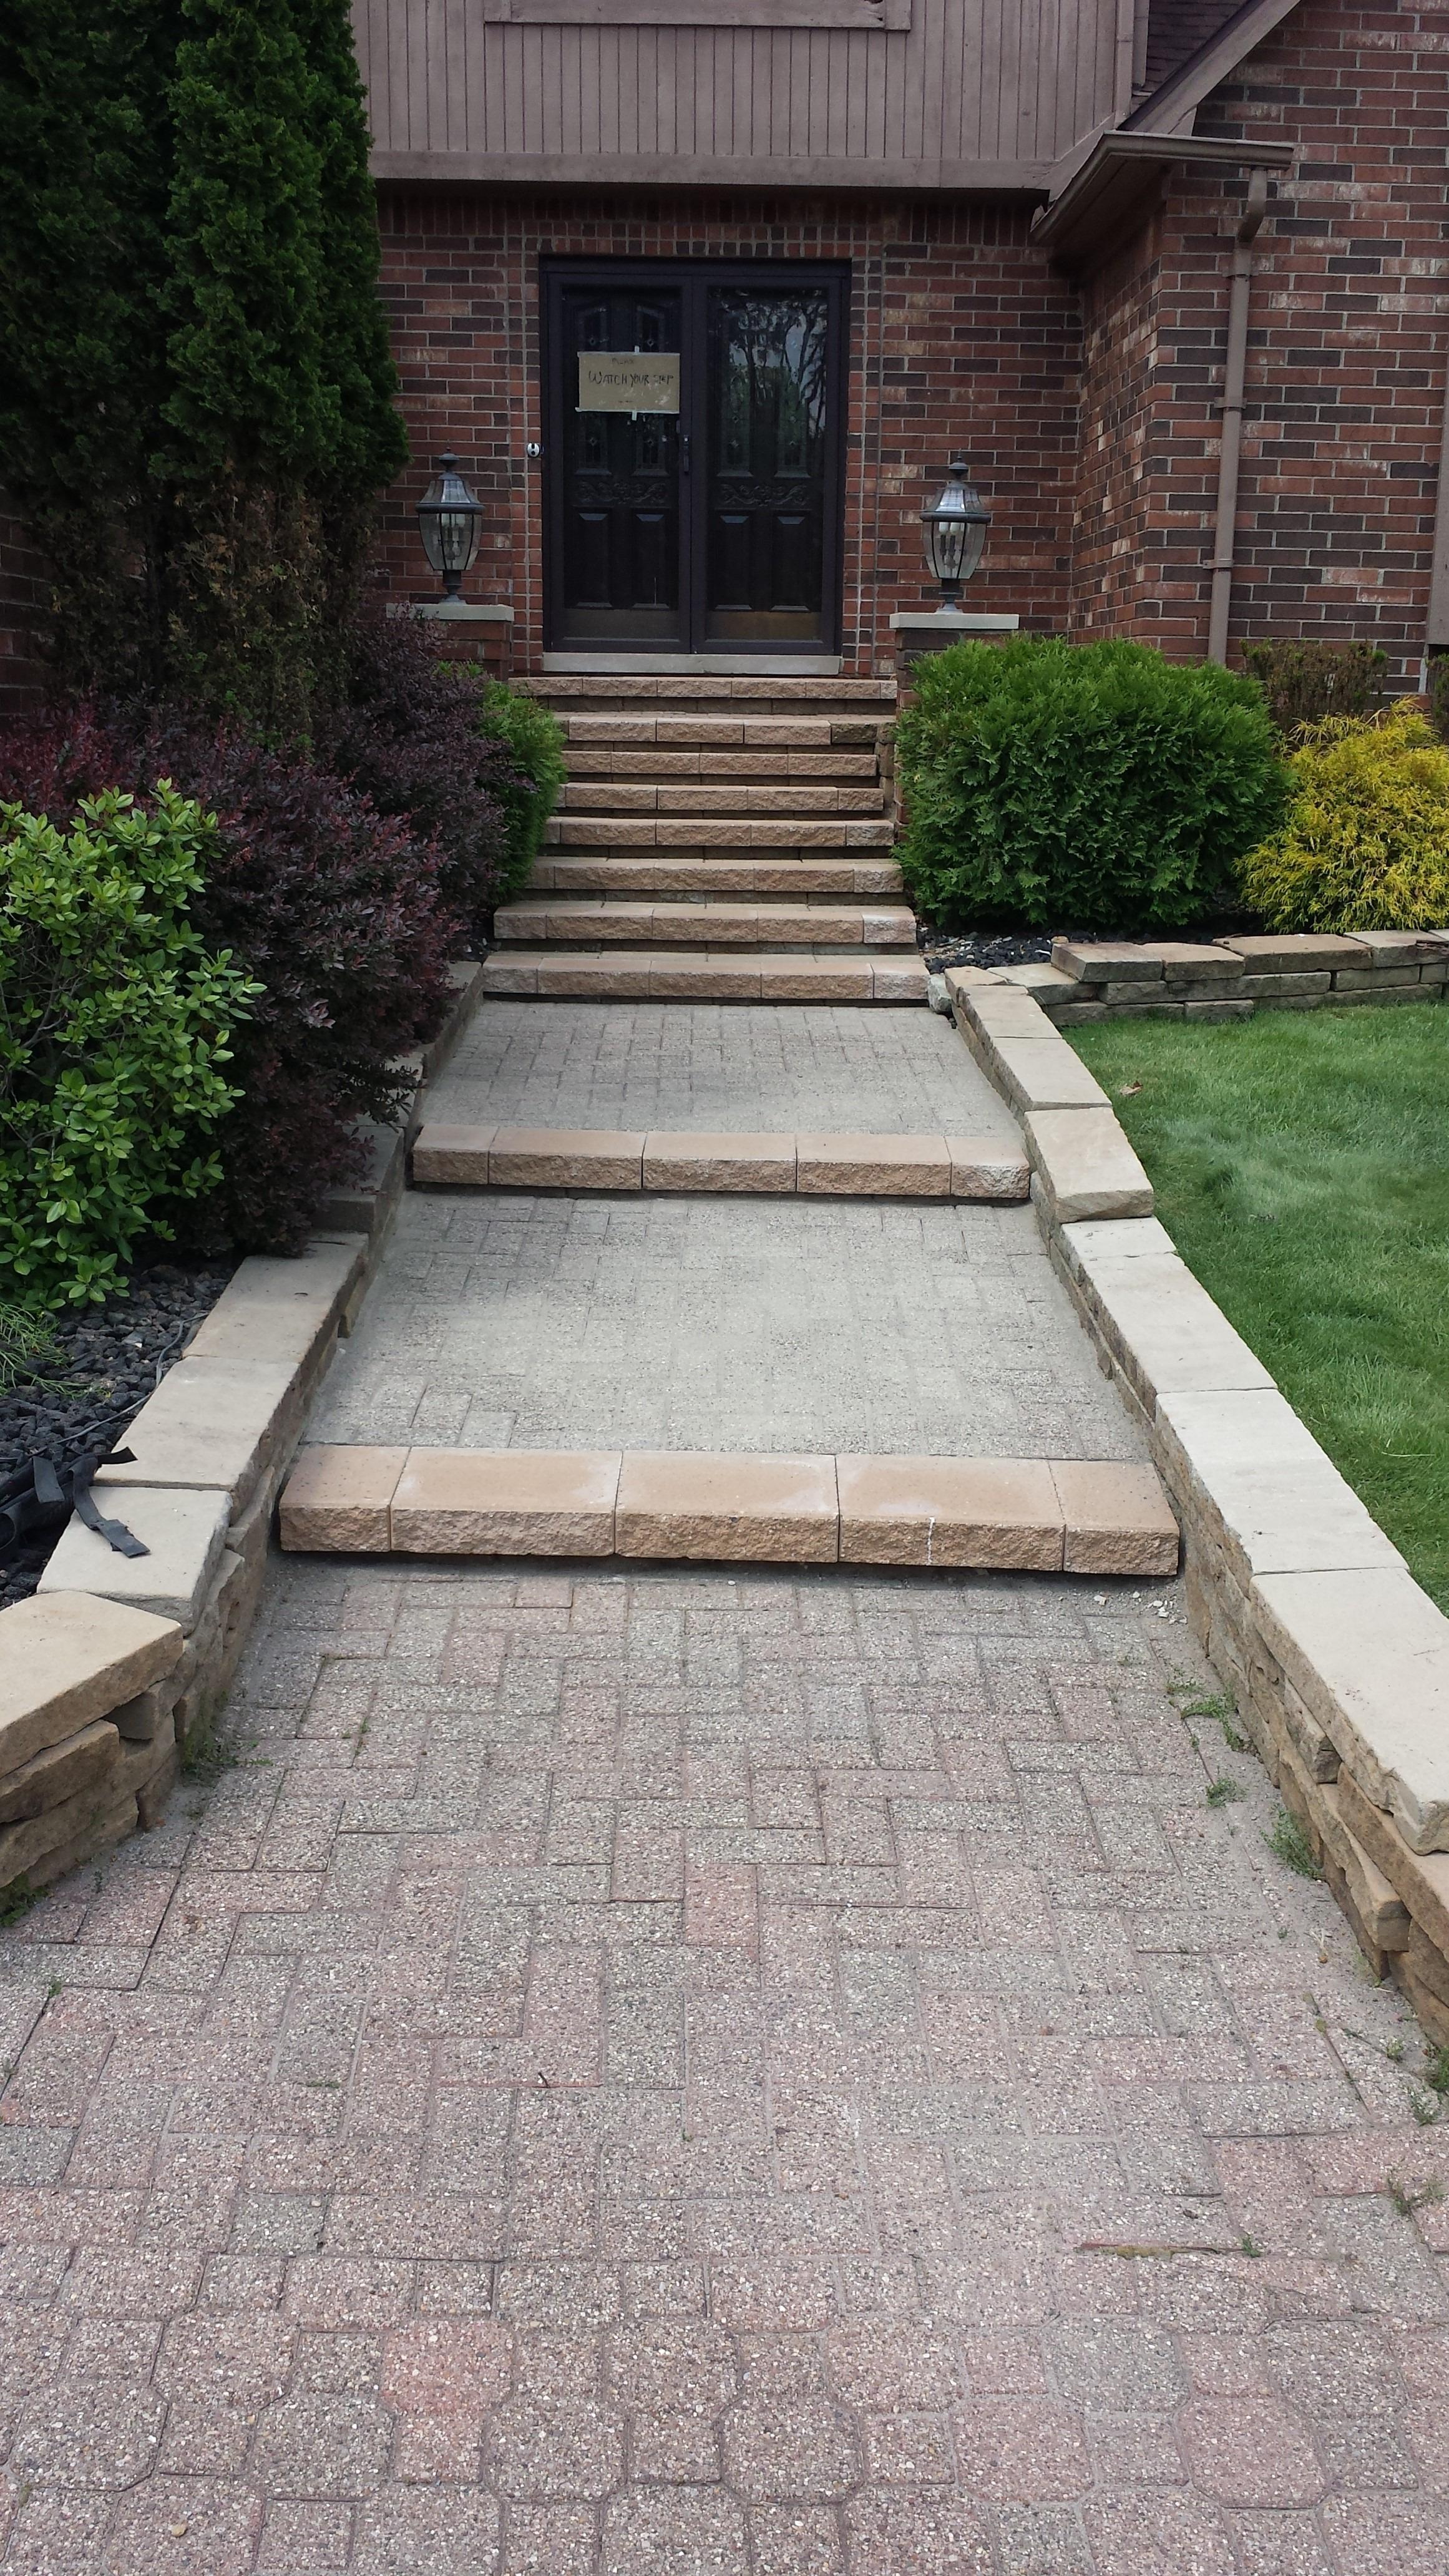 Cornerstone Brick Paving & Landscape image 4